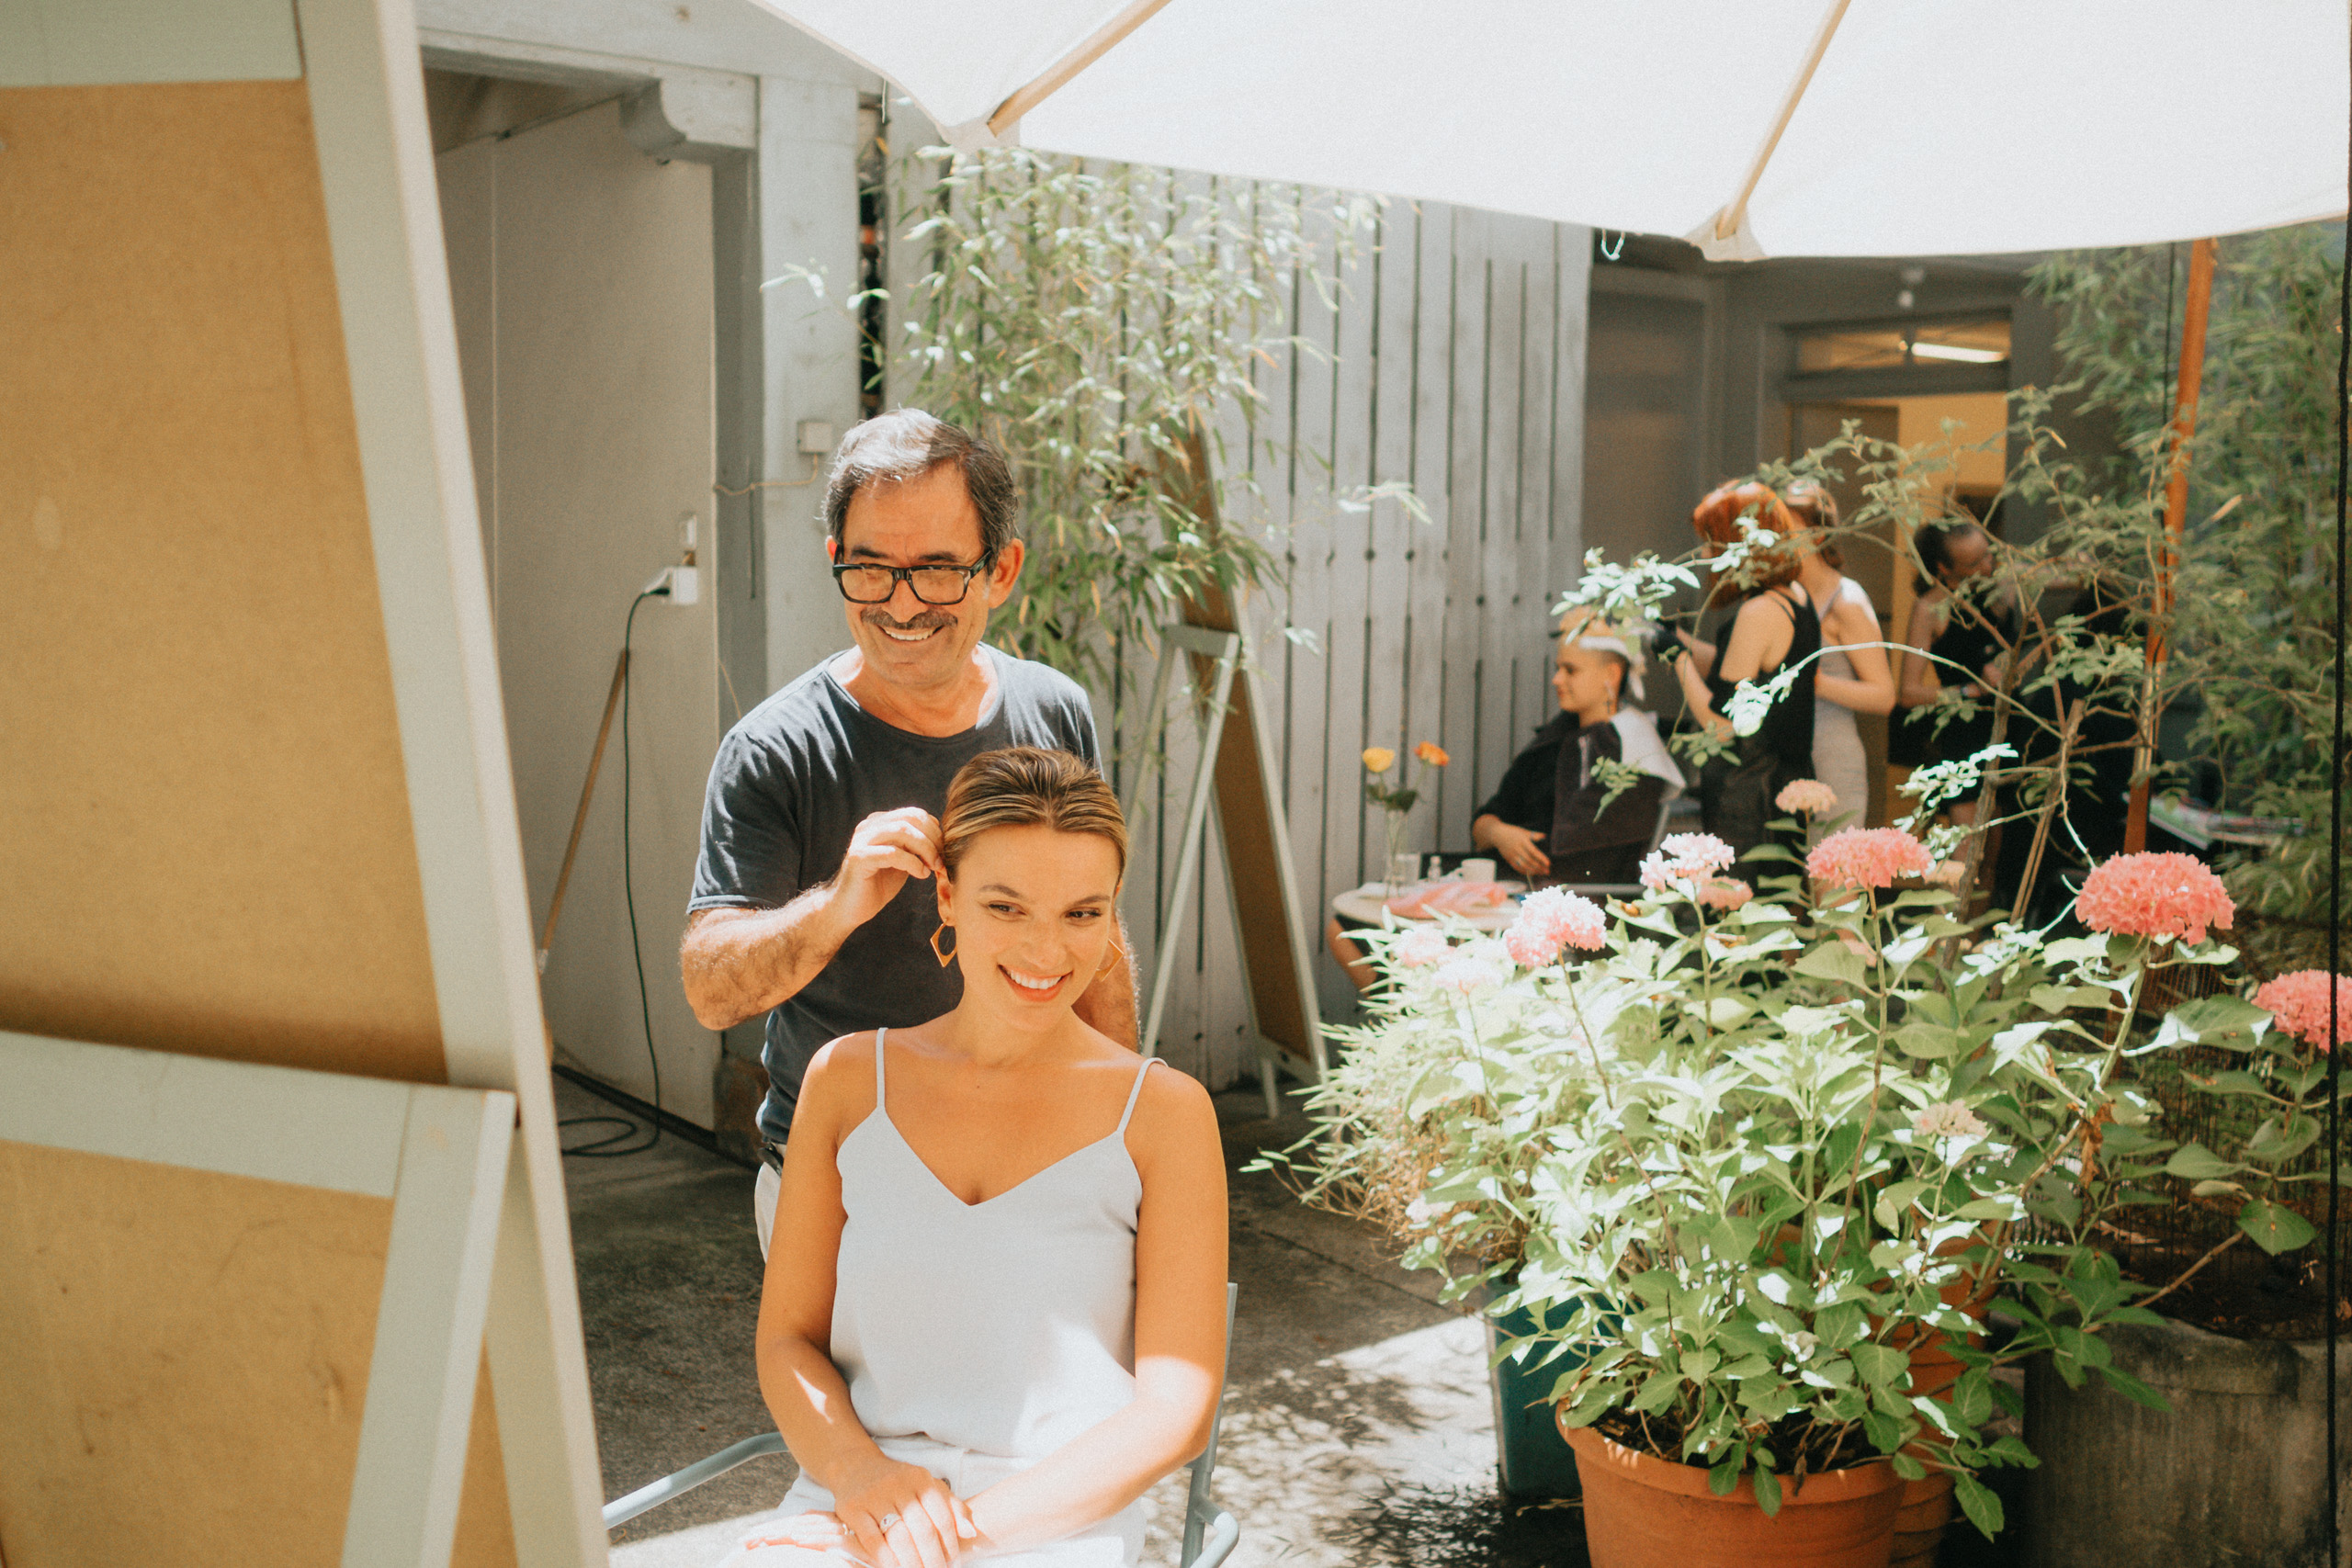 Summerhelde vo Basel: Open-Hair Coiffeur | BaselLive - So lebst du ...